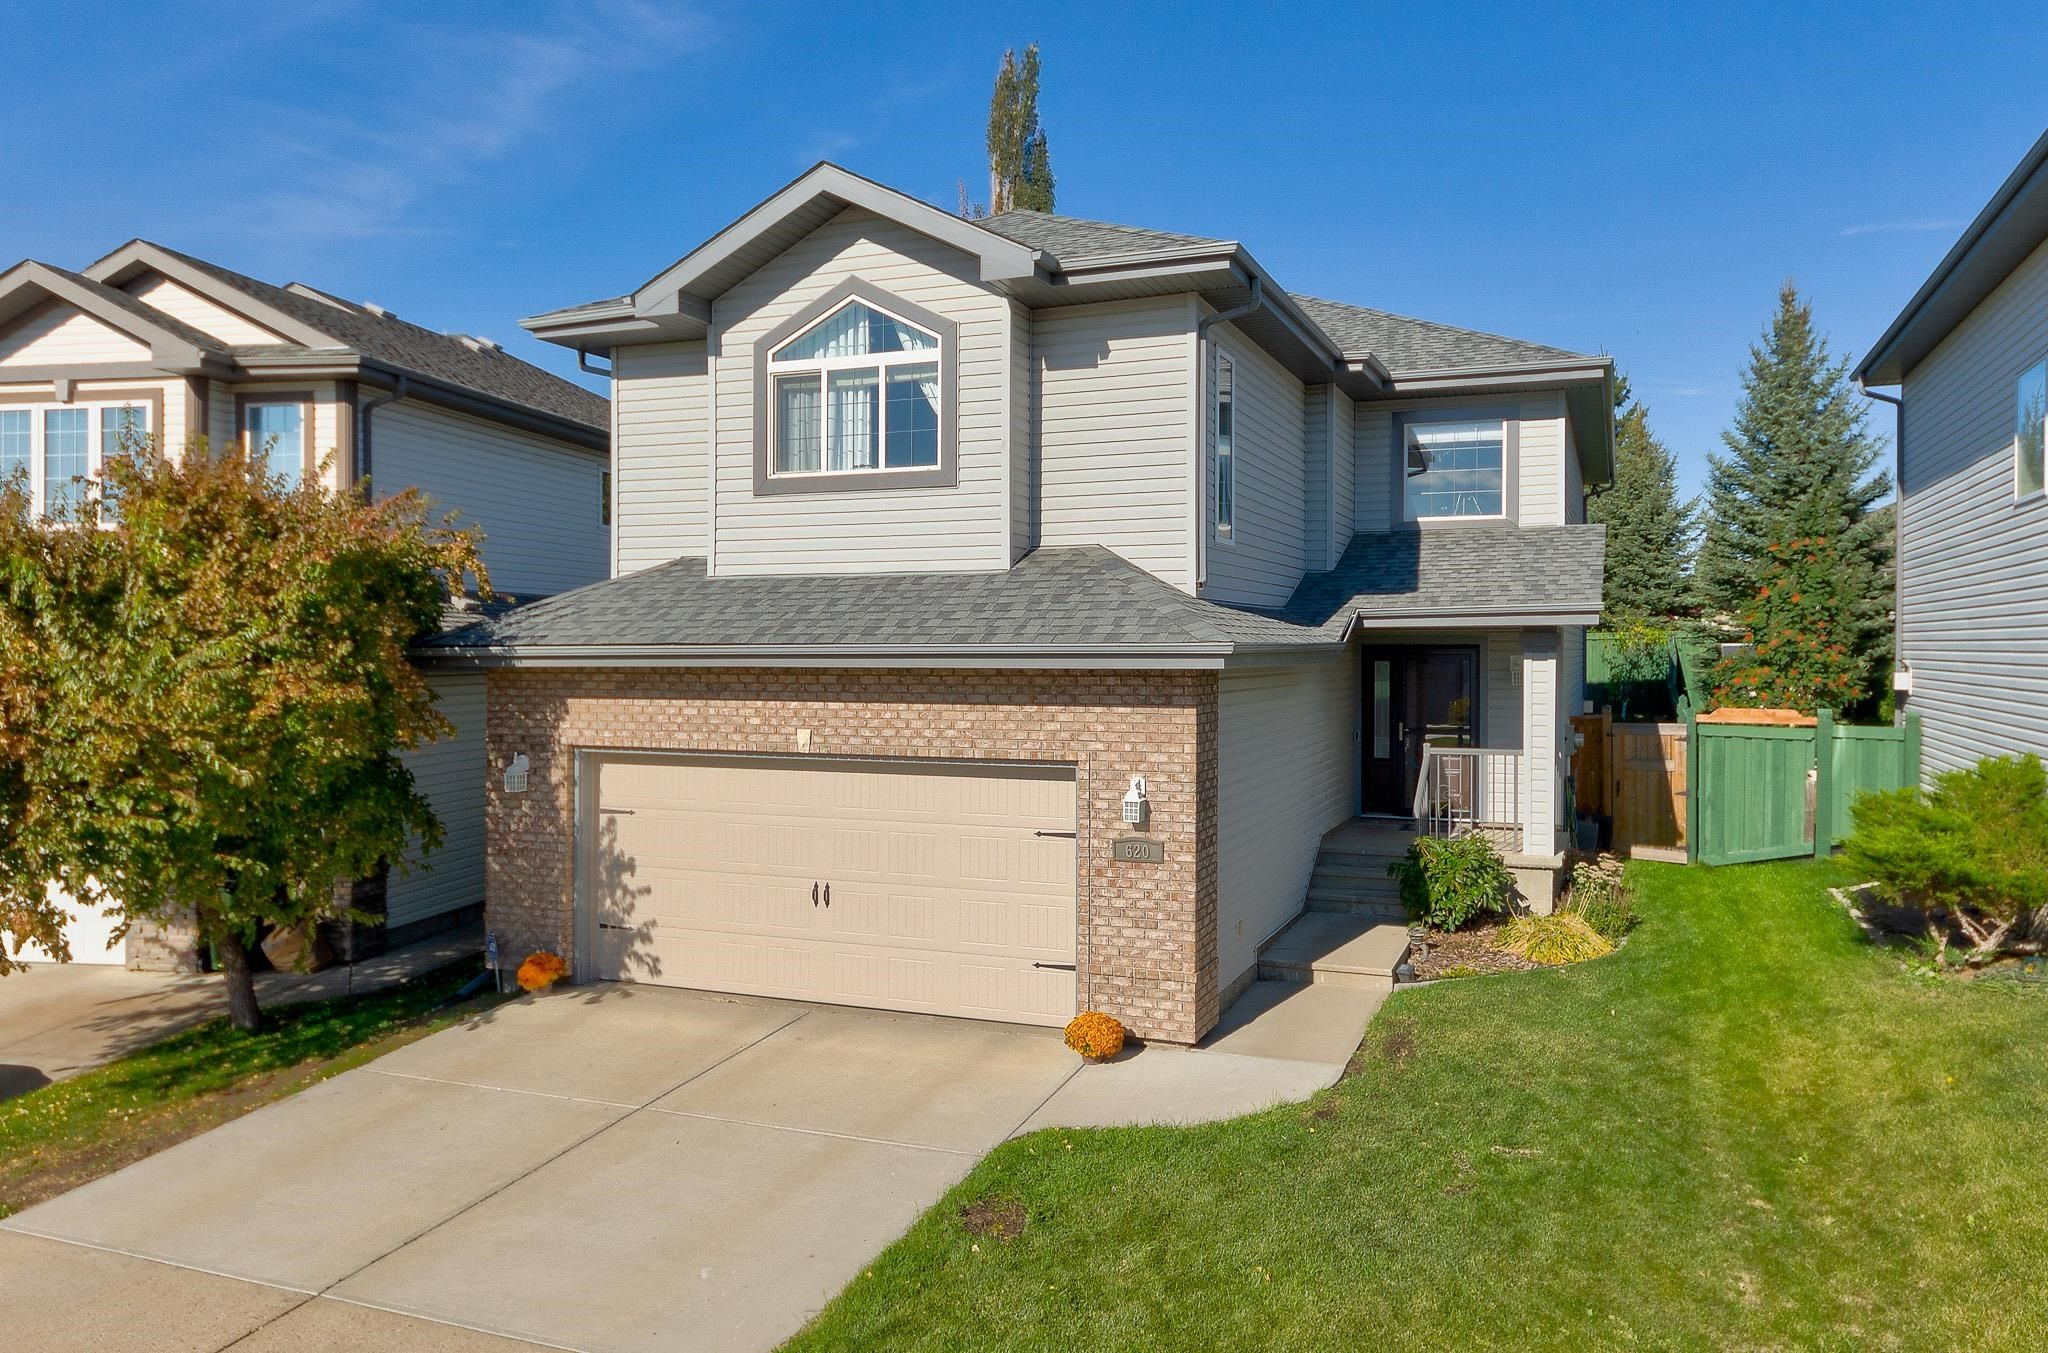 Main Photo: 620 HARKER Close in Edmonton: Zone 14 House for sale : MLS®# E4264081